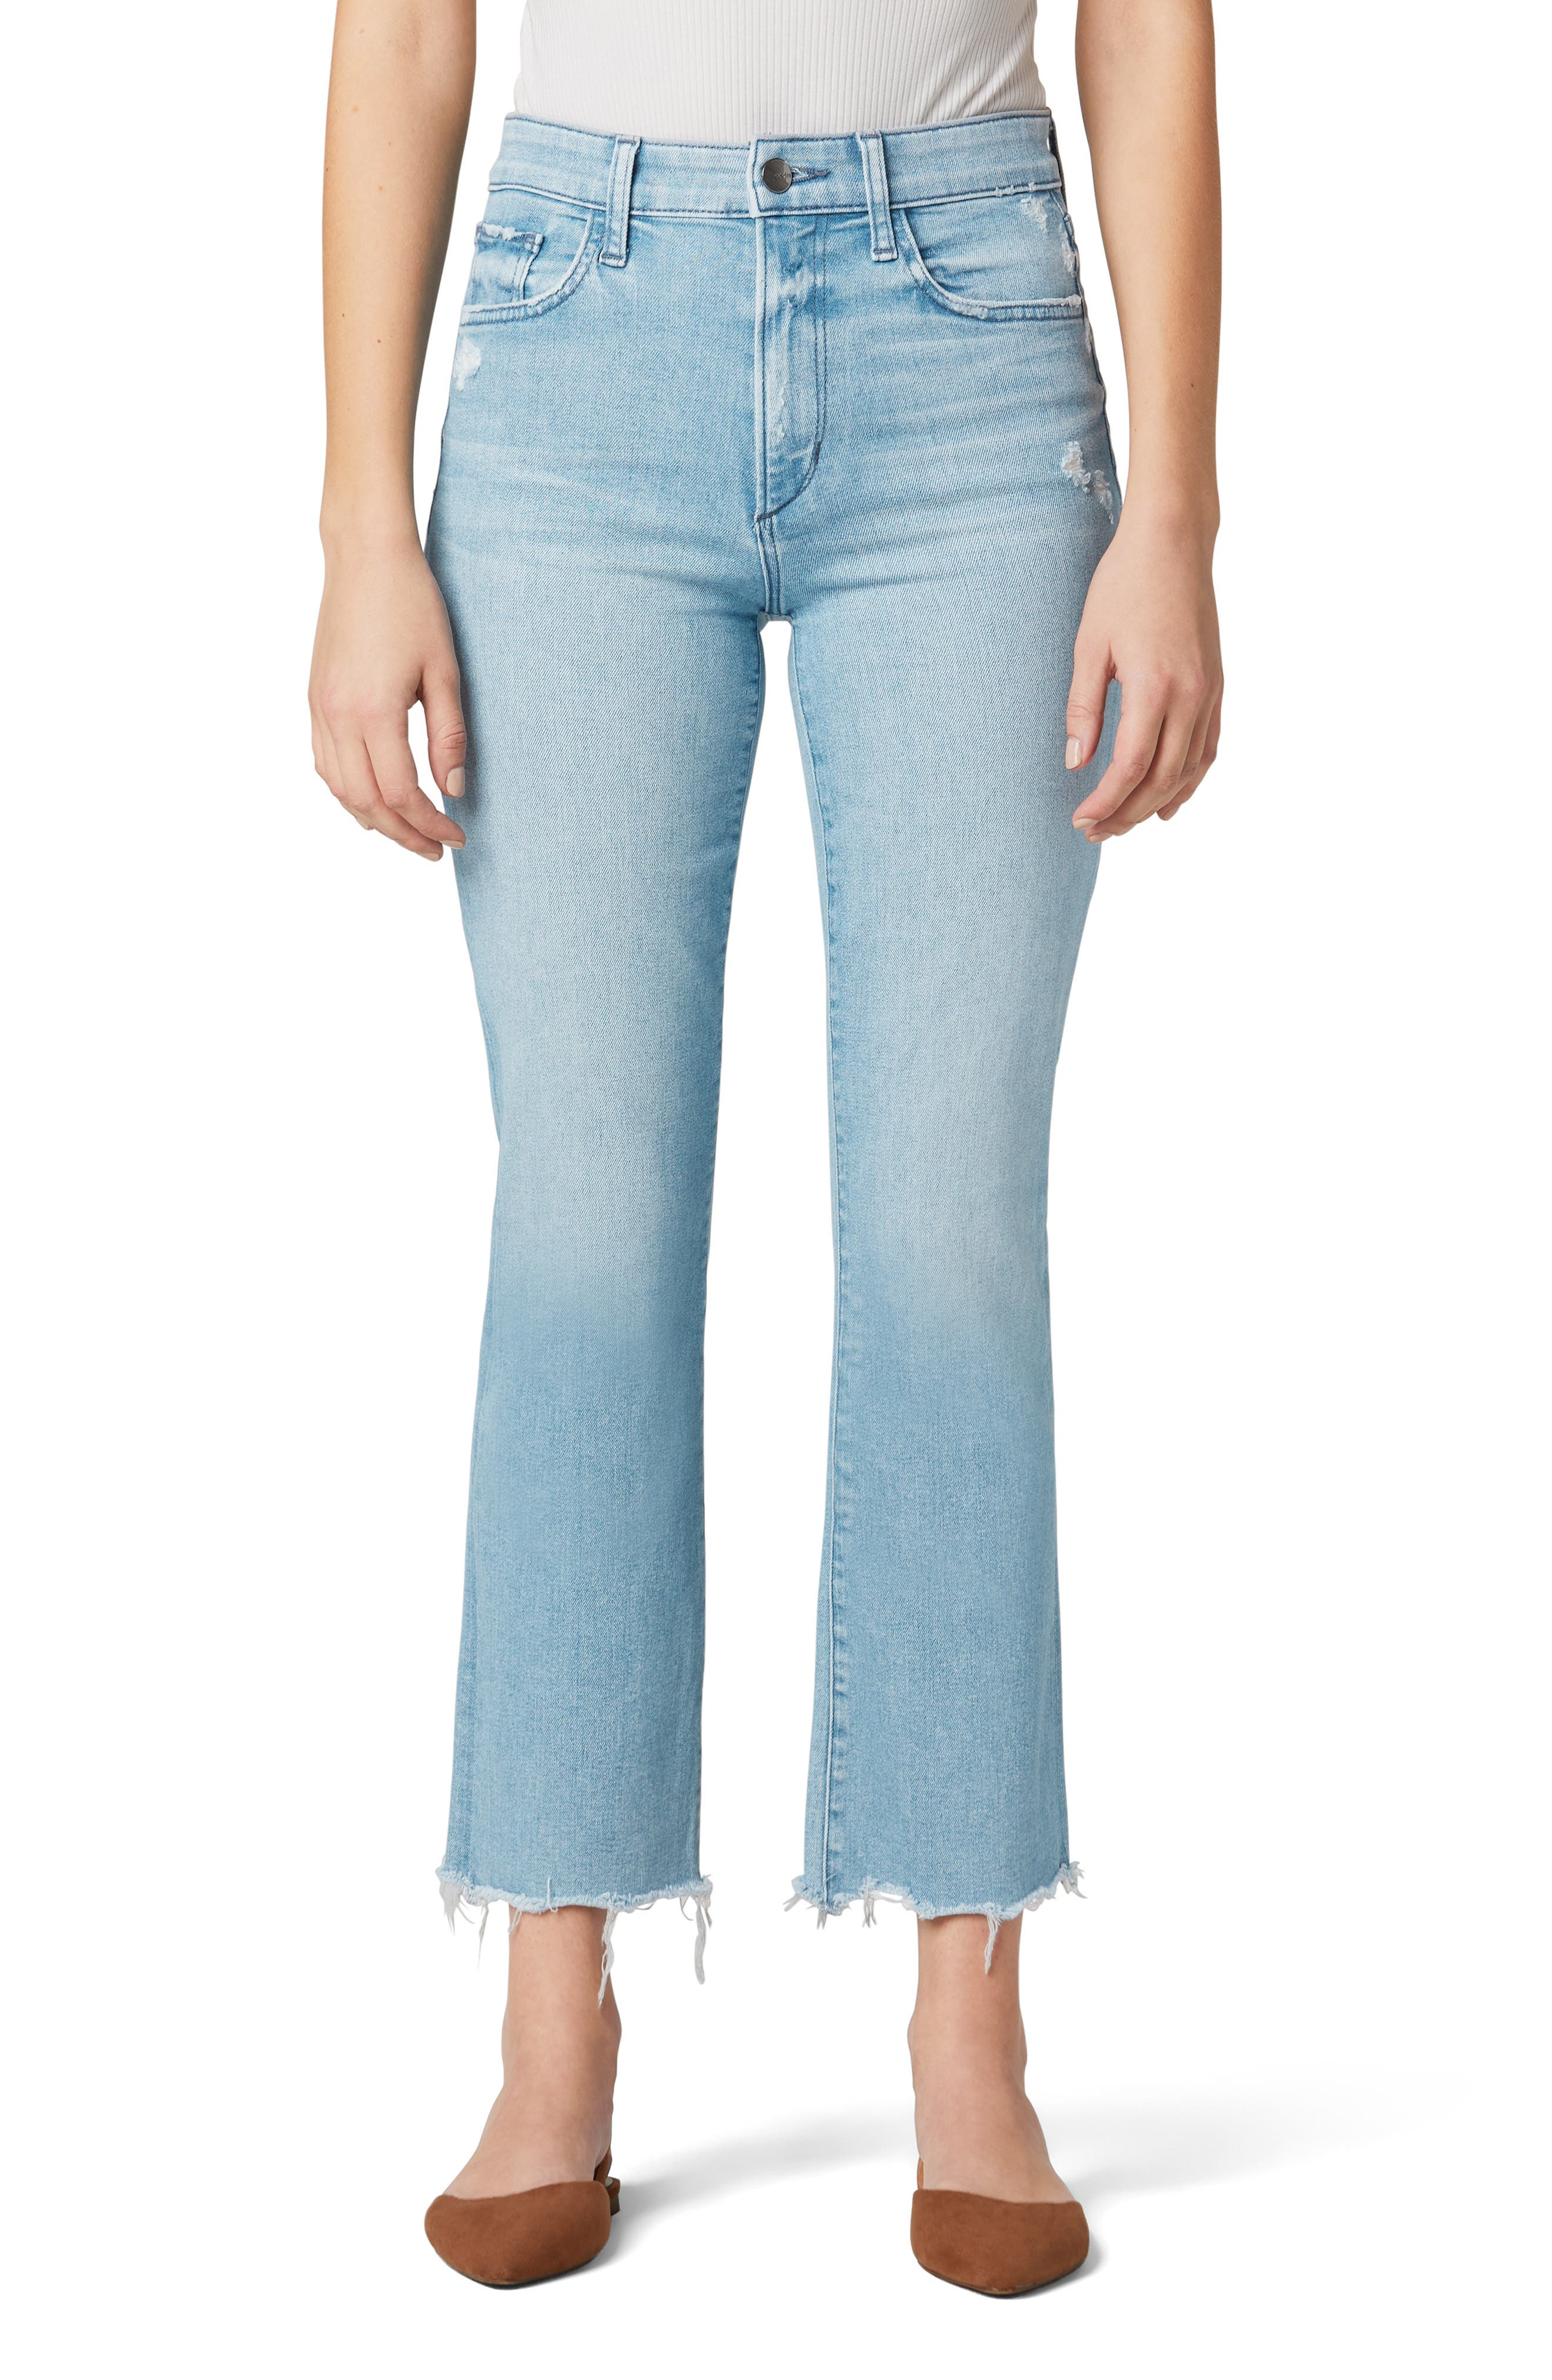 The Callie High Waist Fray Hem Crop Flare Jeans